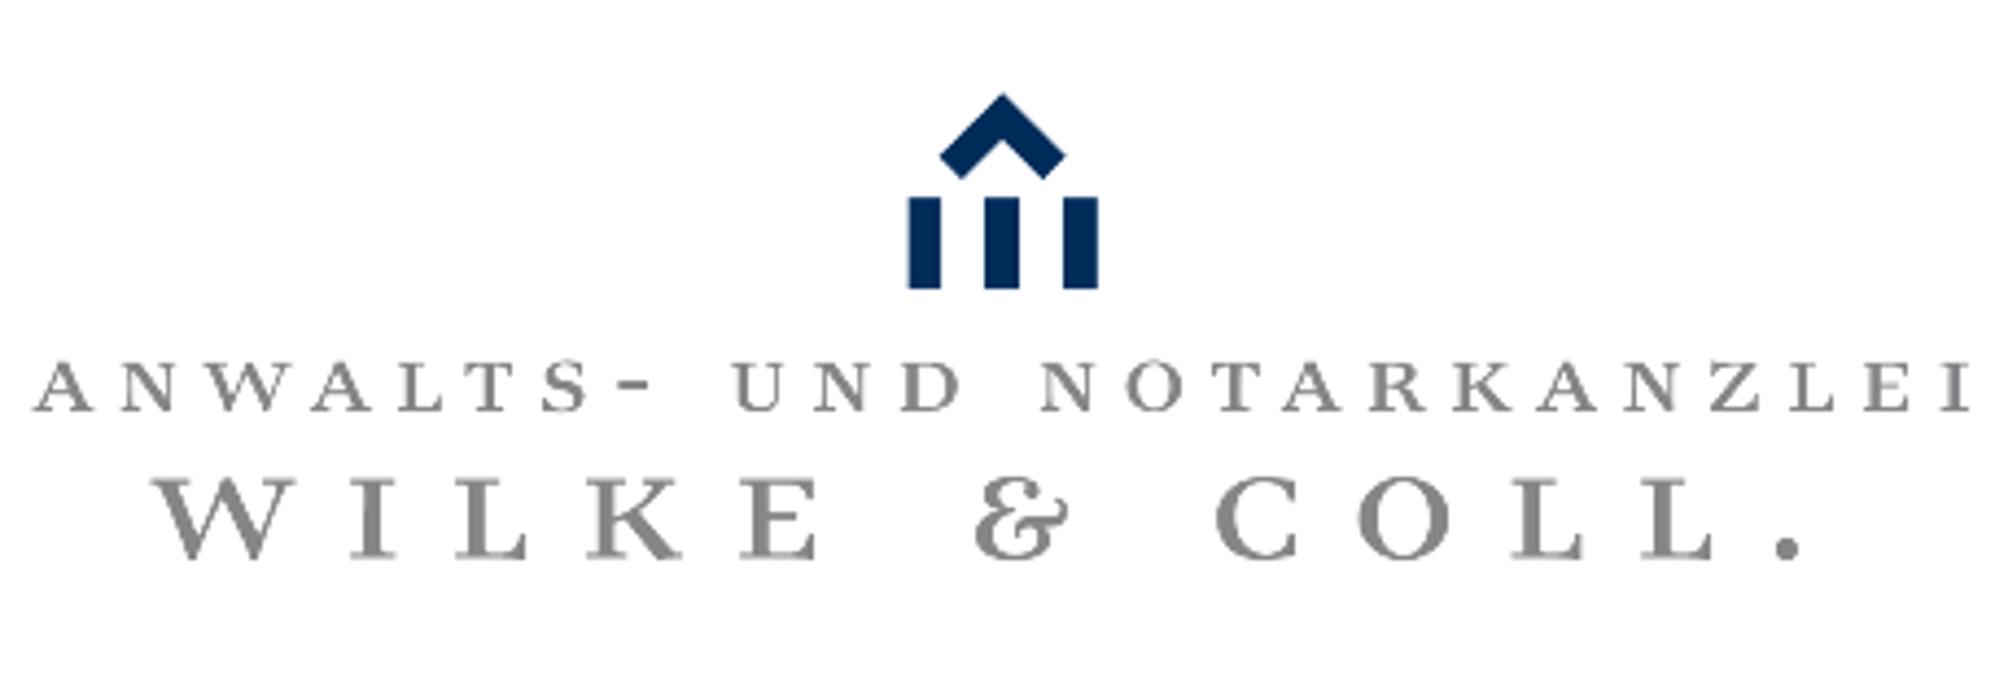 Bild zu Anwaltskanzlei Wilke & Coll. in Darmstadt